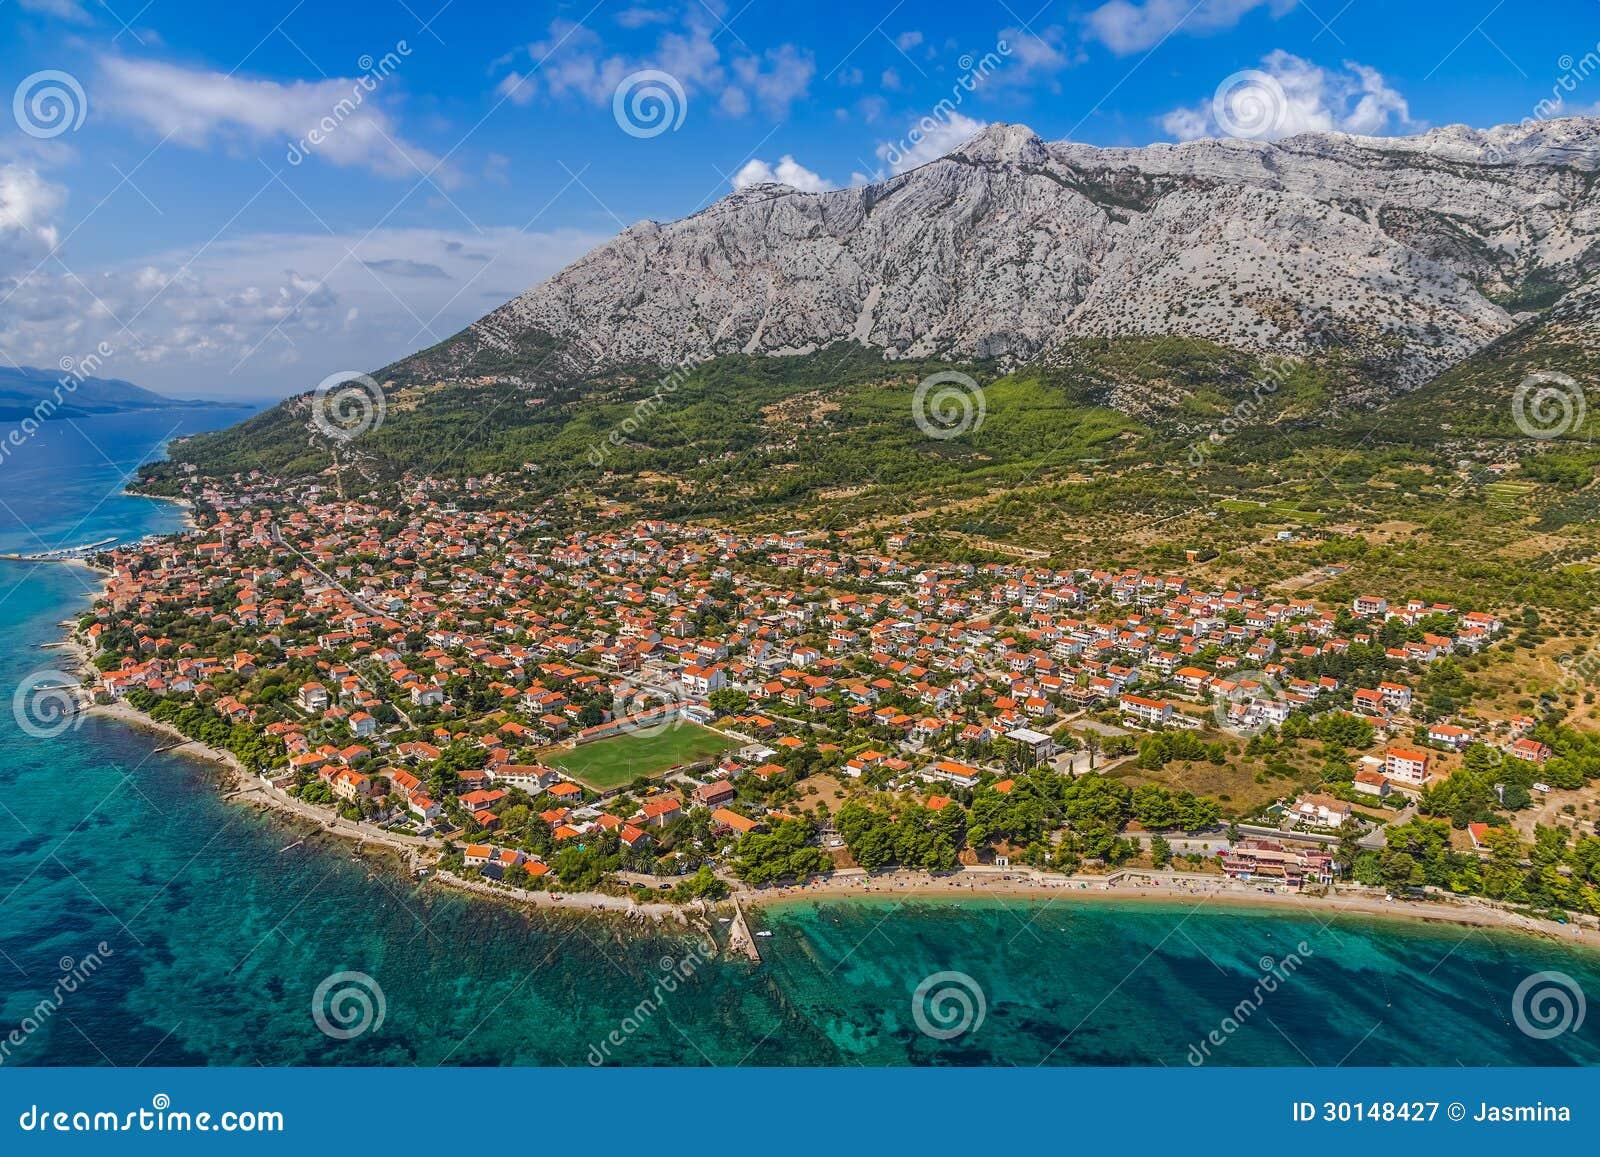 Orebic Croatia  city images : Orebic, Croatia Royalty Free Stock Photography Image: 30148427